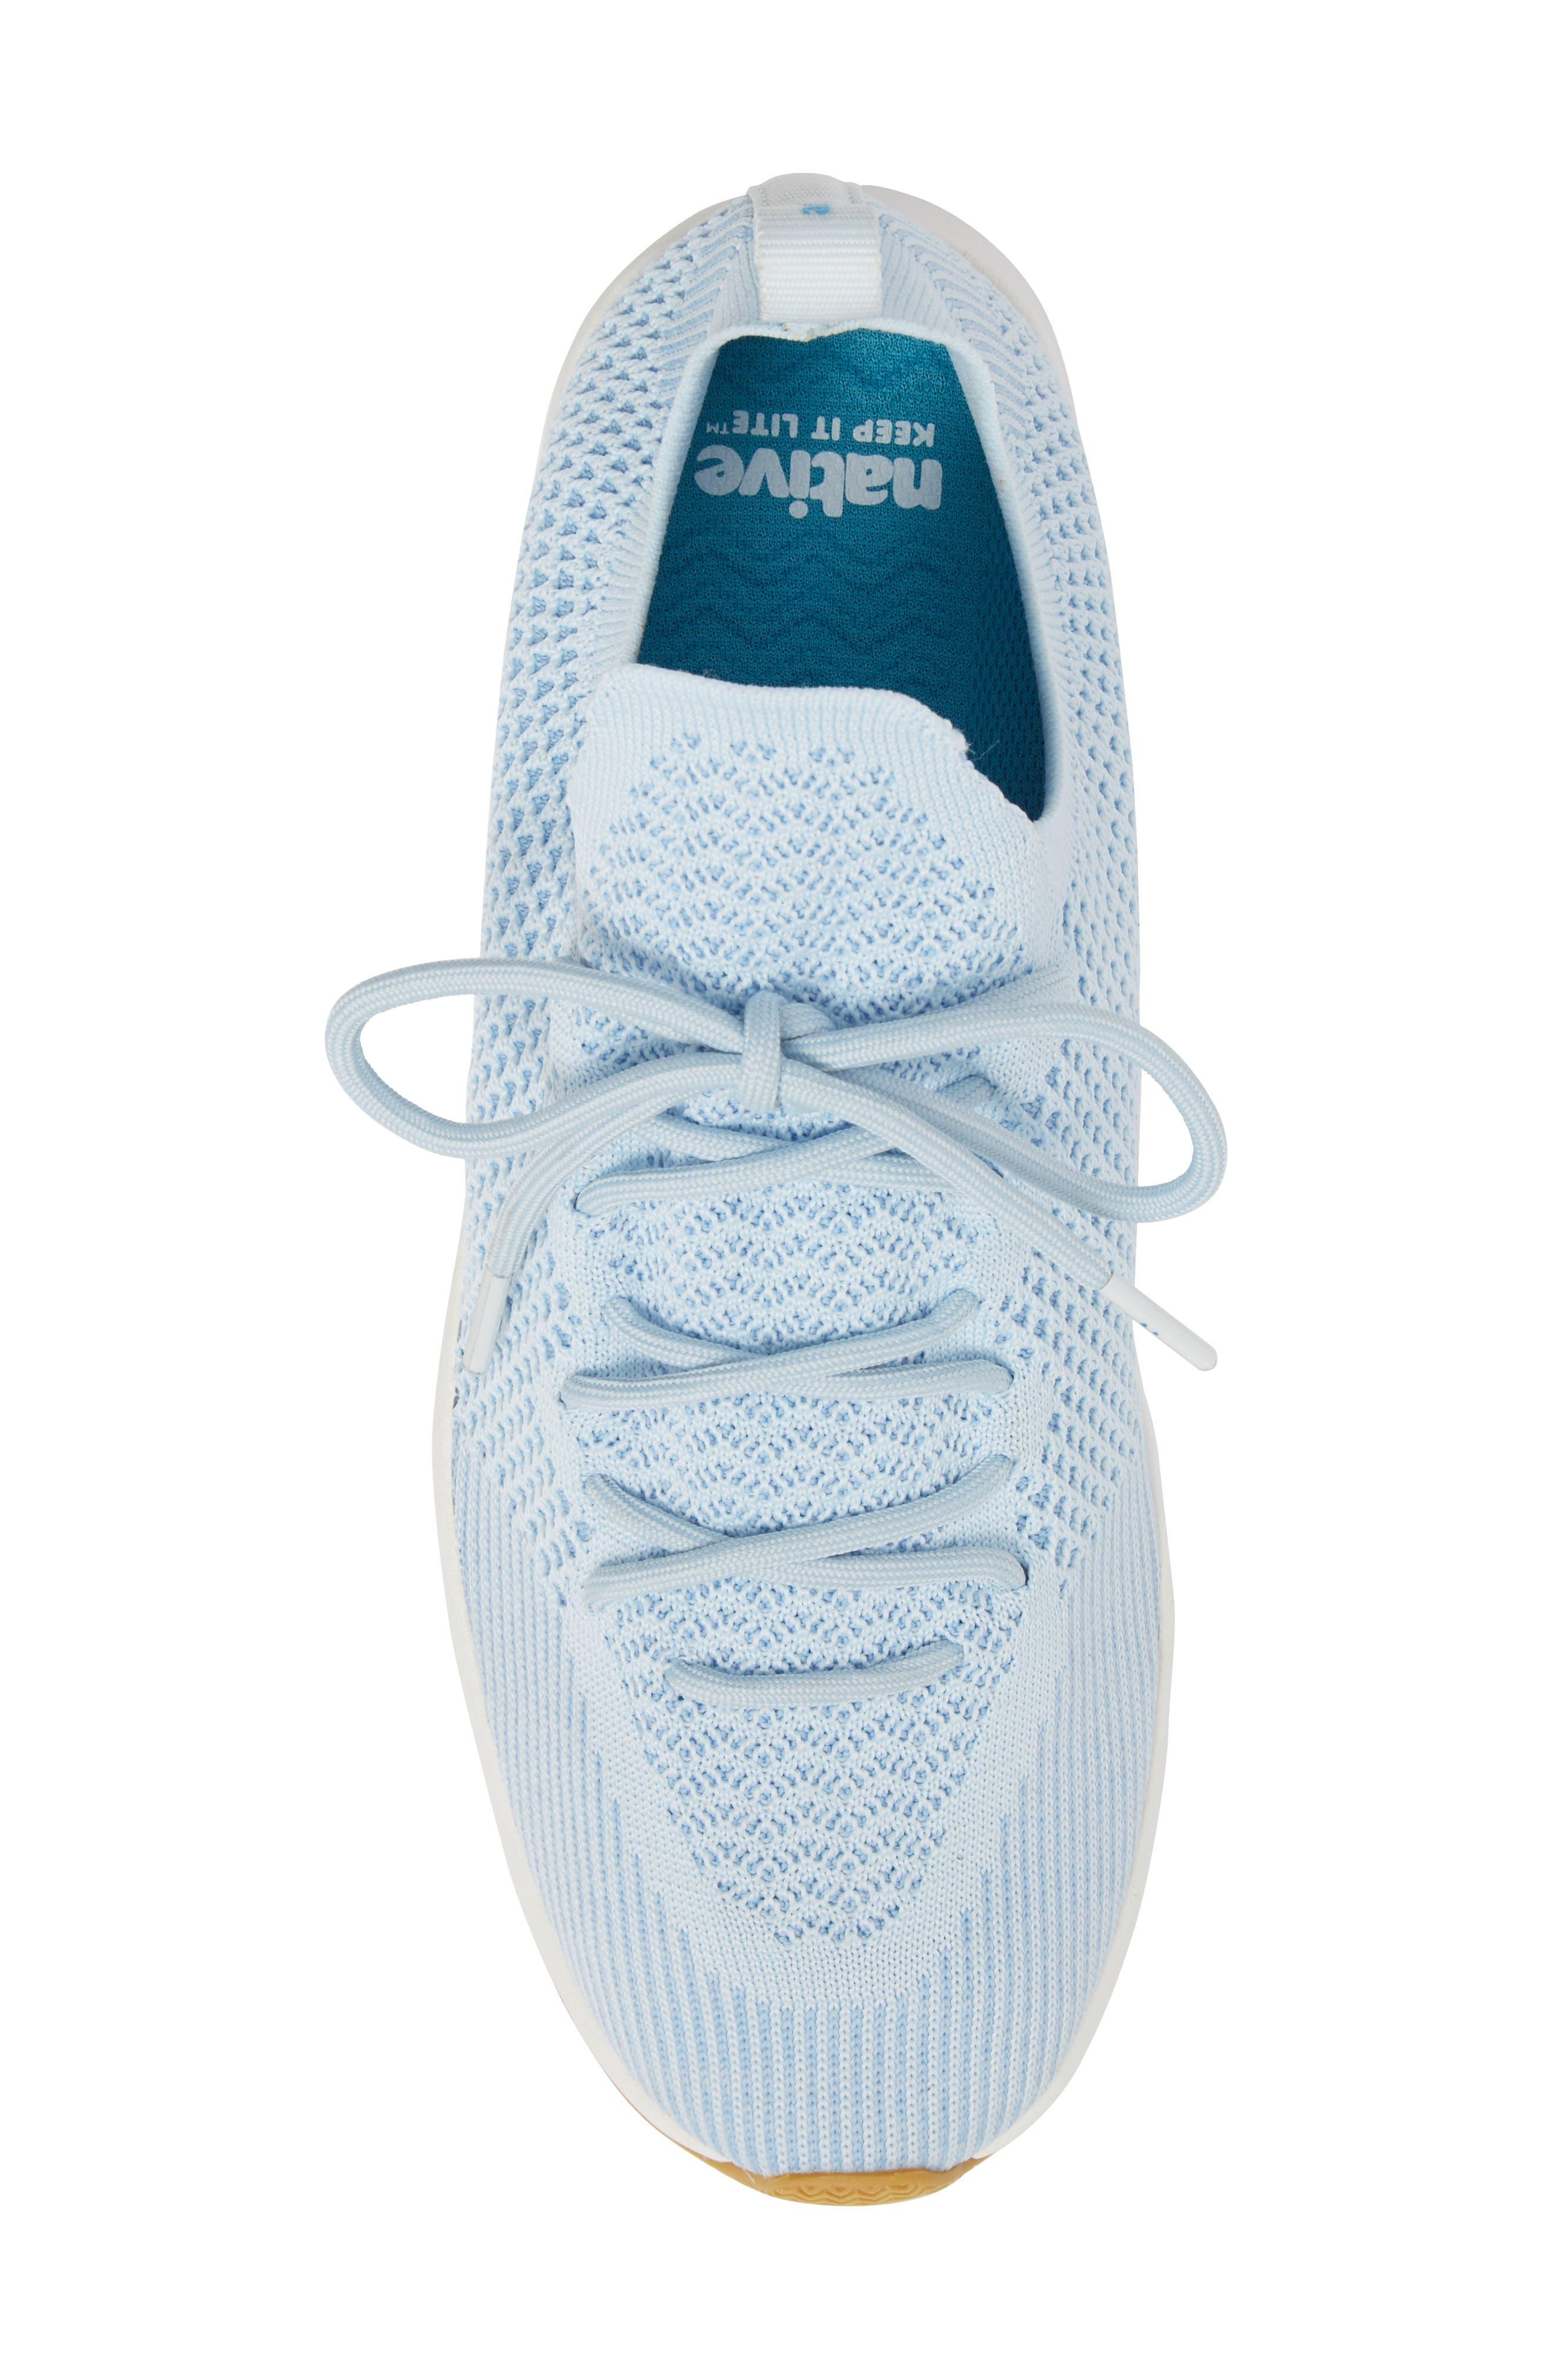 AP Mercury Liteknit<sup>™</sup> Sneaker,                             Alternate thumbnail 5, color,                             AIR BLUE/ SHELL WHITE